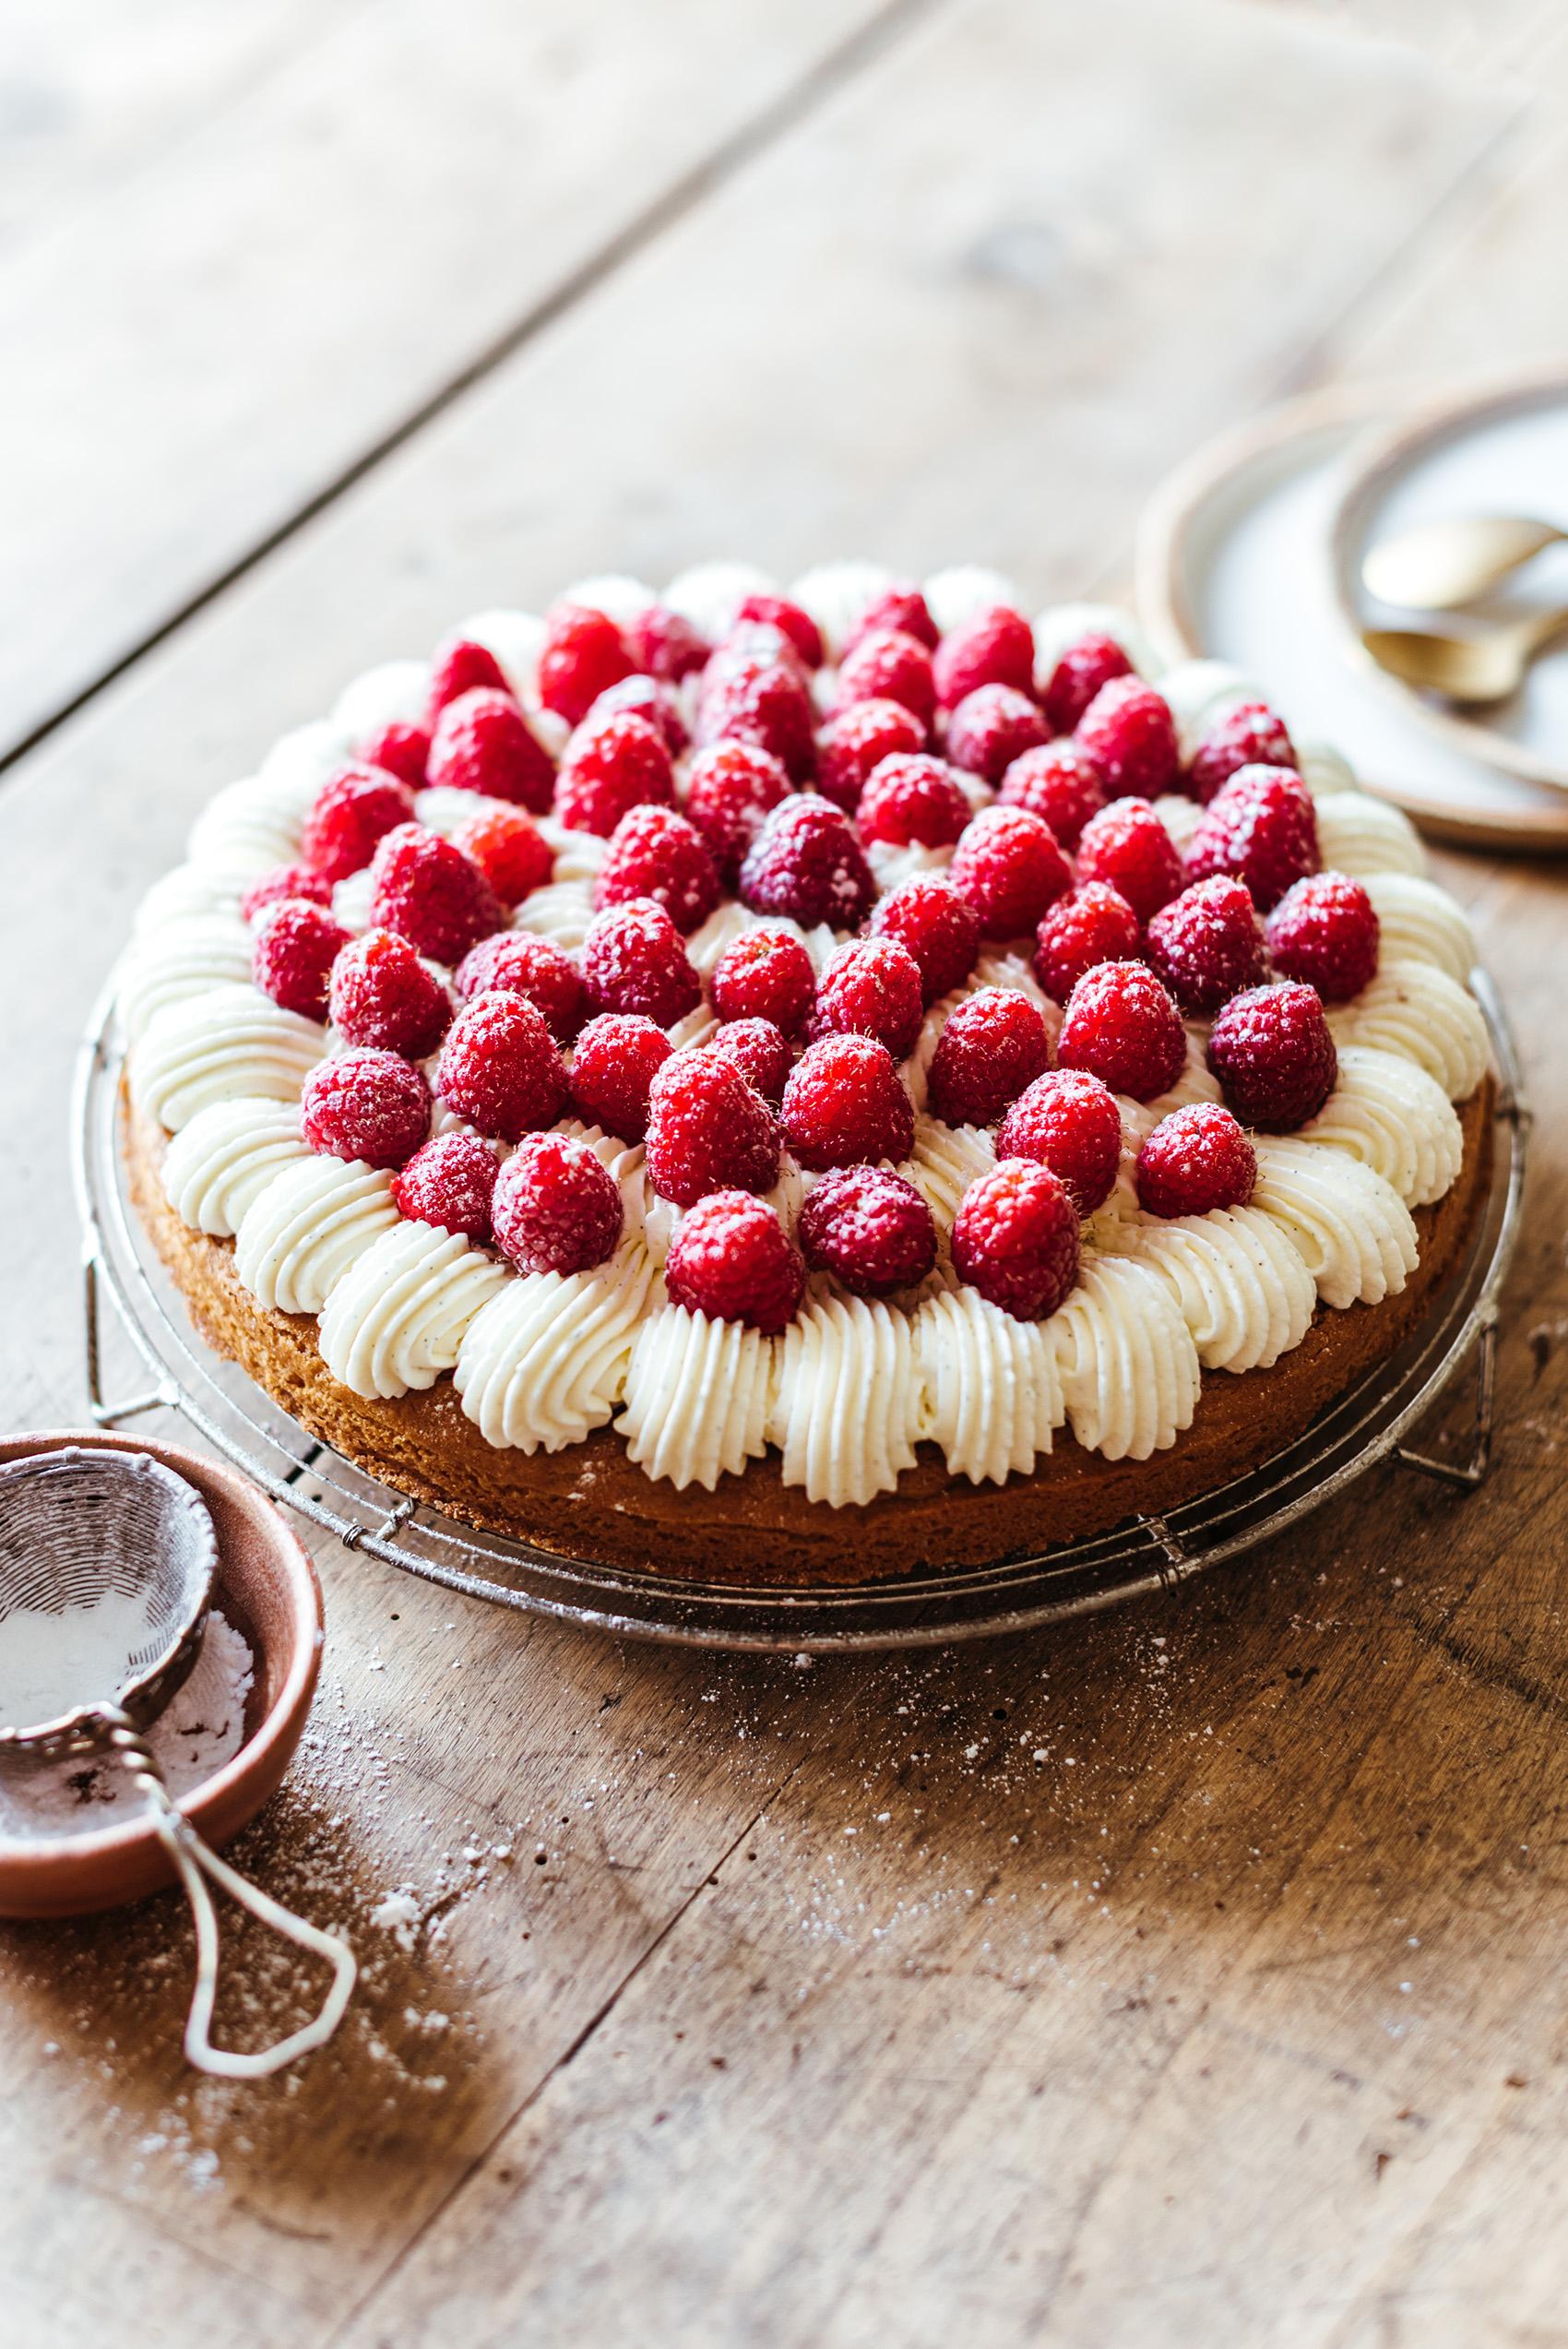 Tarte framboise crème vanillée palet breton - Lilie Bakery